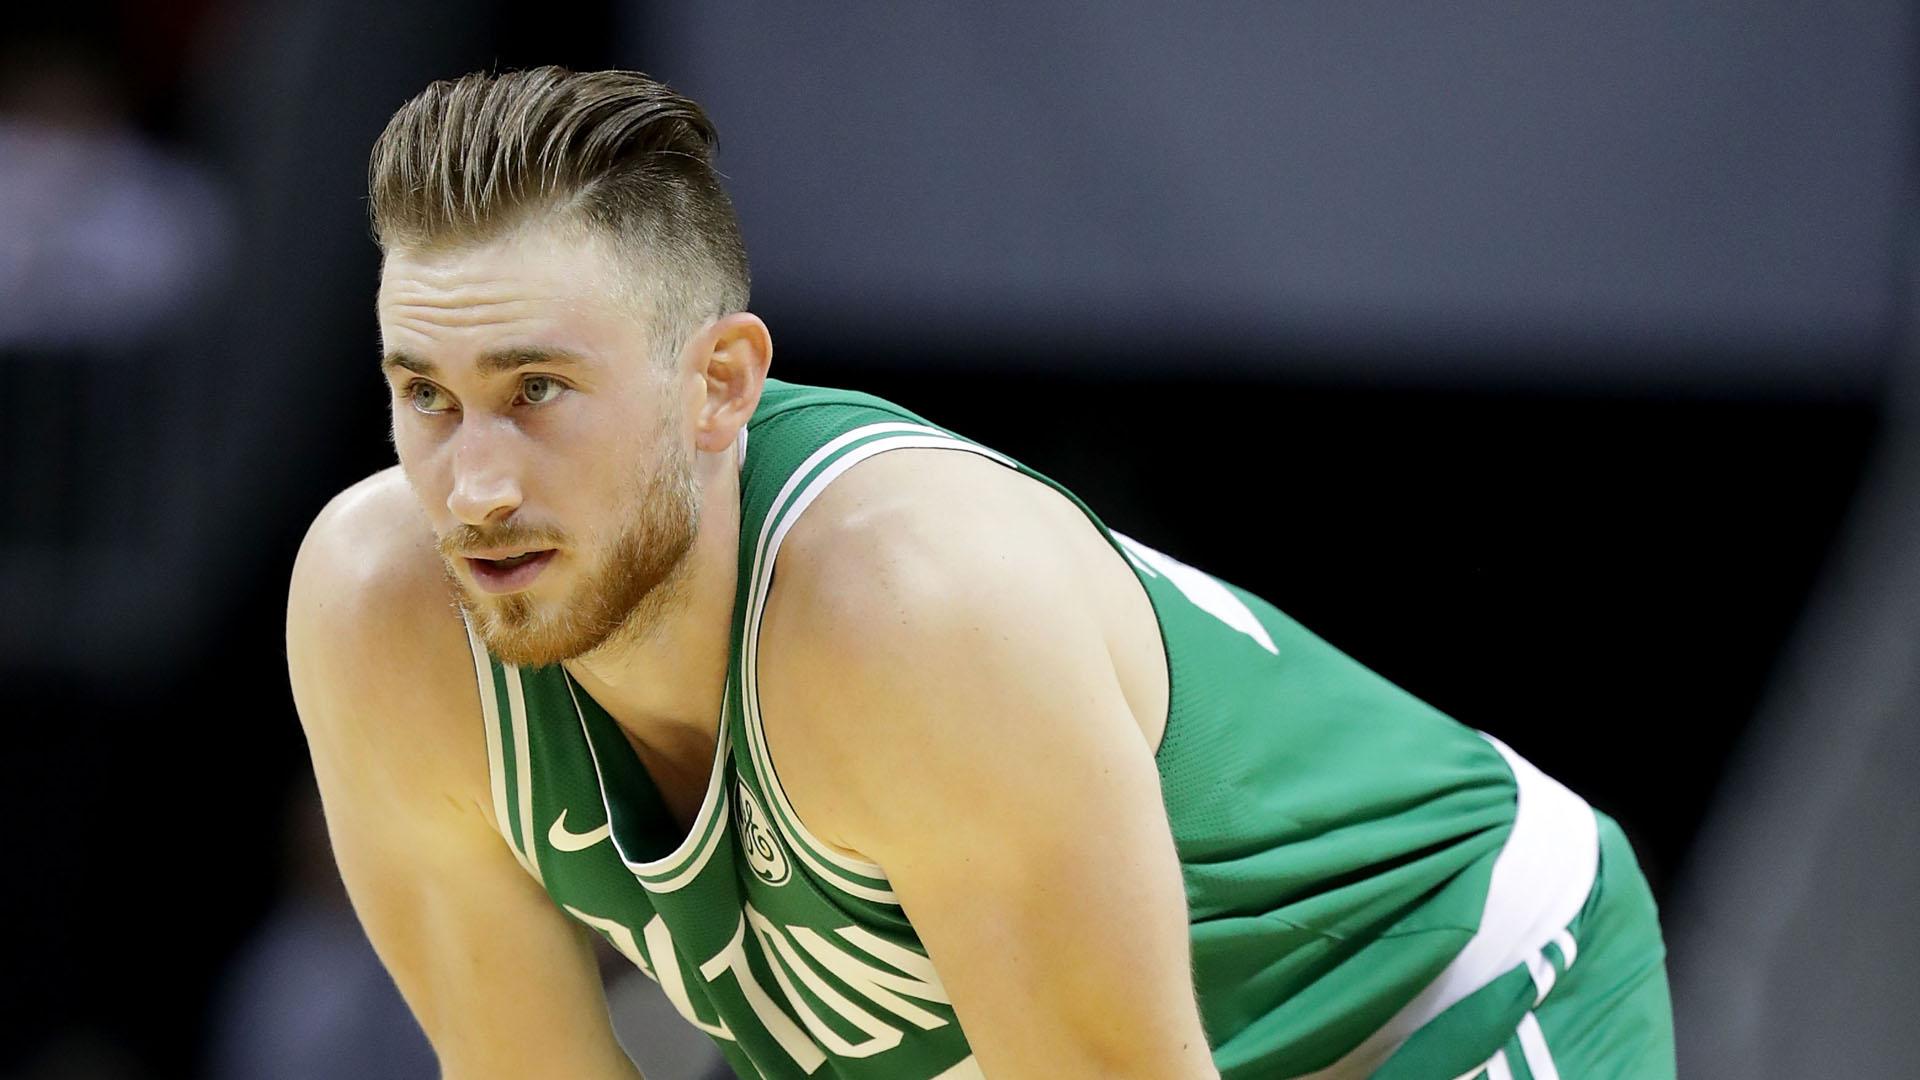 Gordon Hayward injury update: Celtics forward leaves game vs. Hawks with neck strain